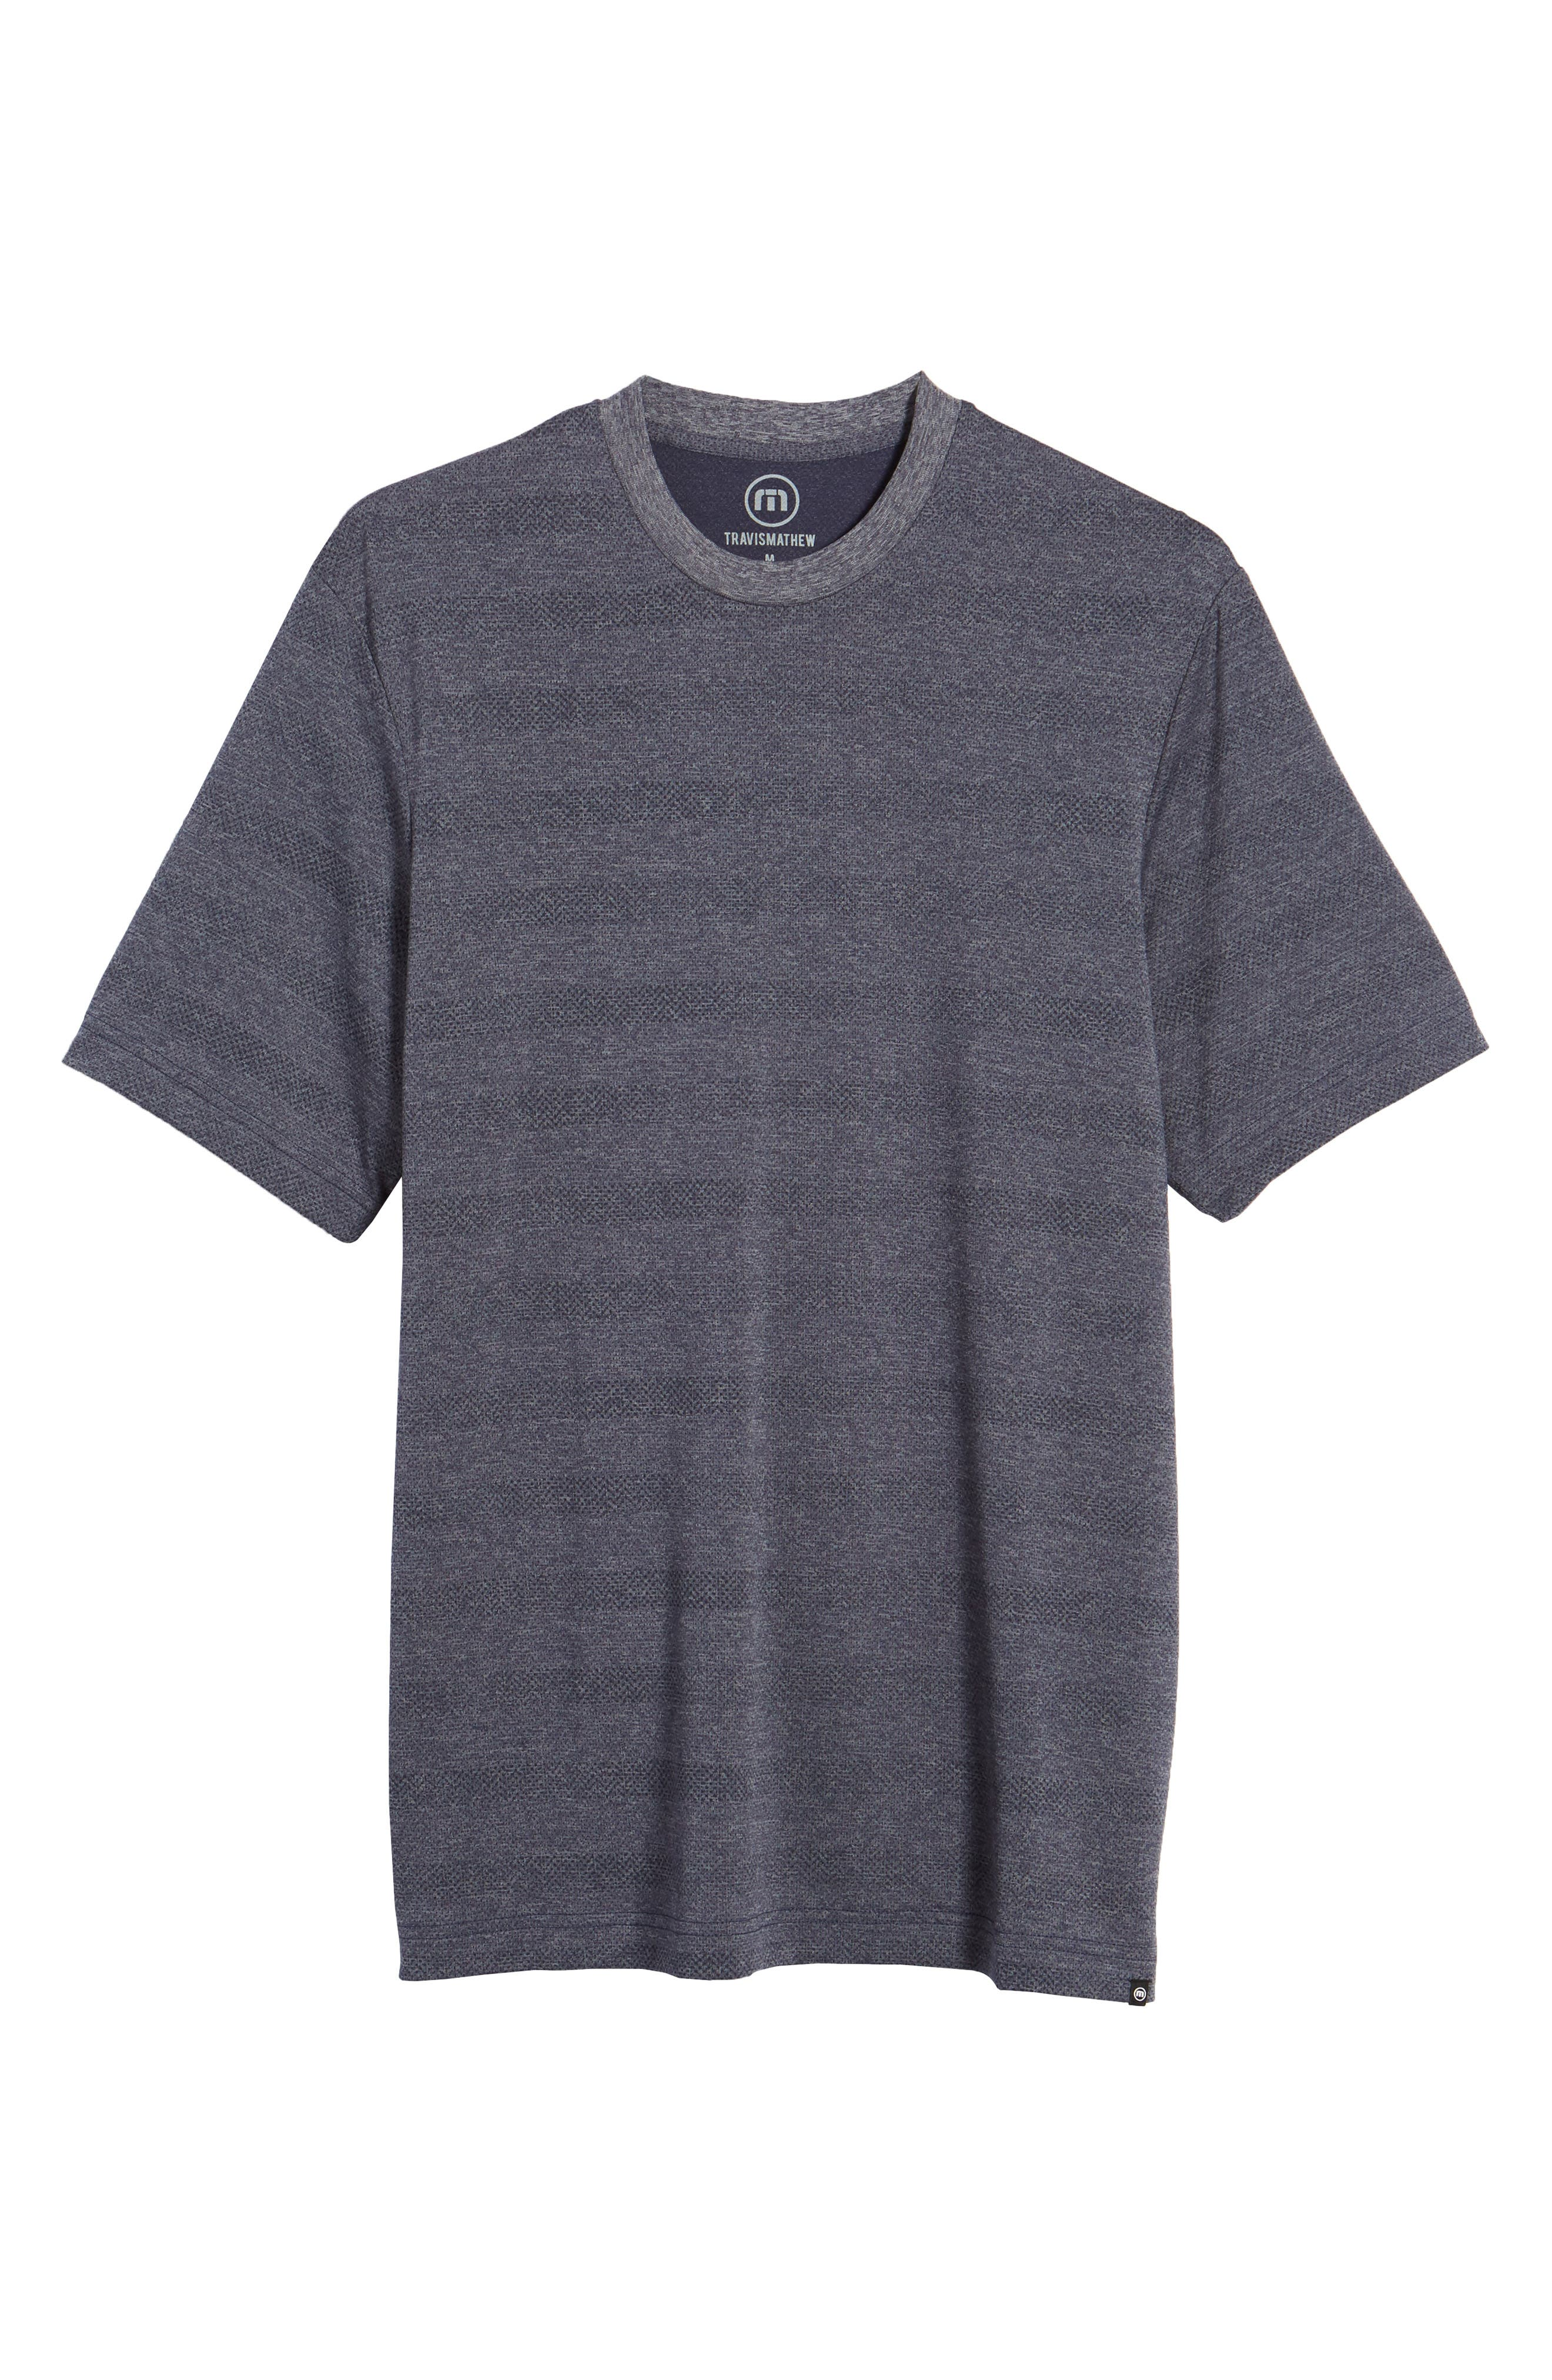 Upshift T-Shirt,                             Alternate thumbnail 6, color,                             HEATHER GRIFFIN